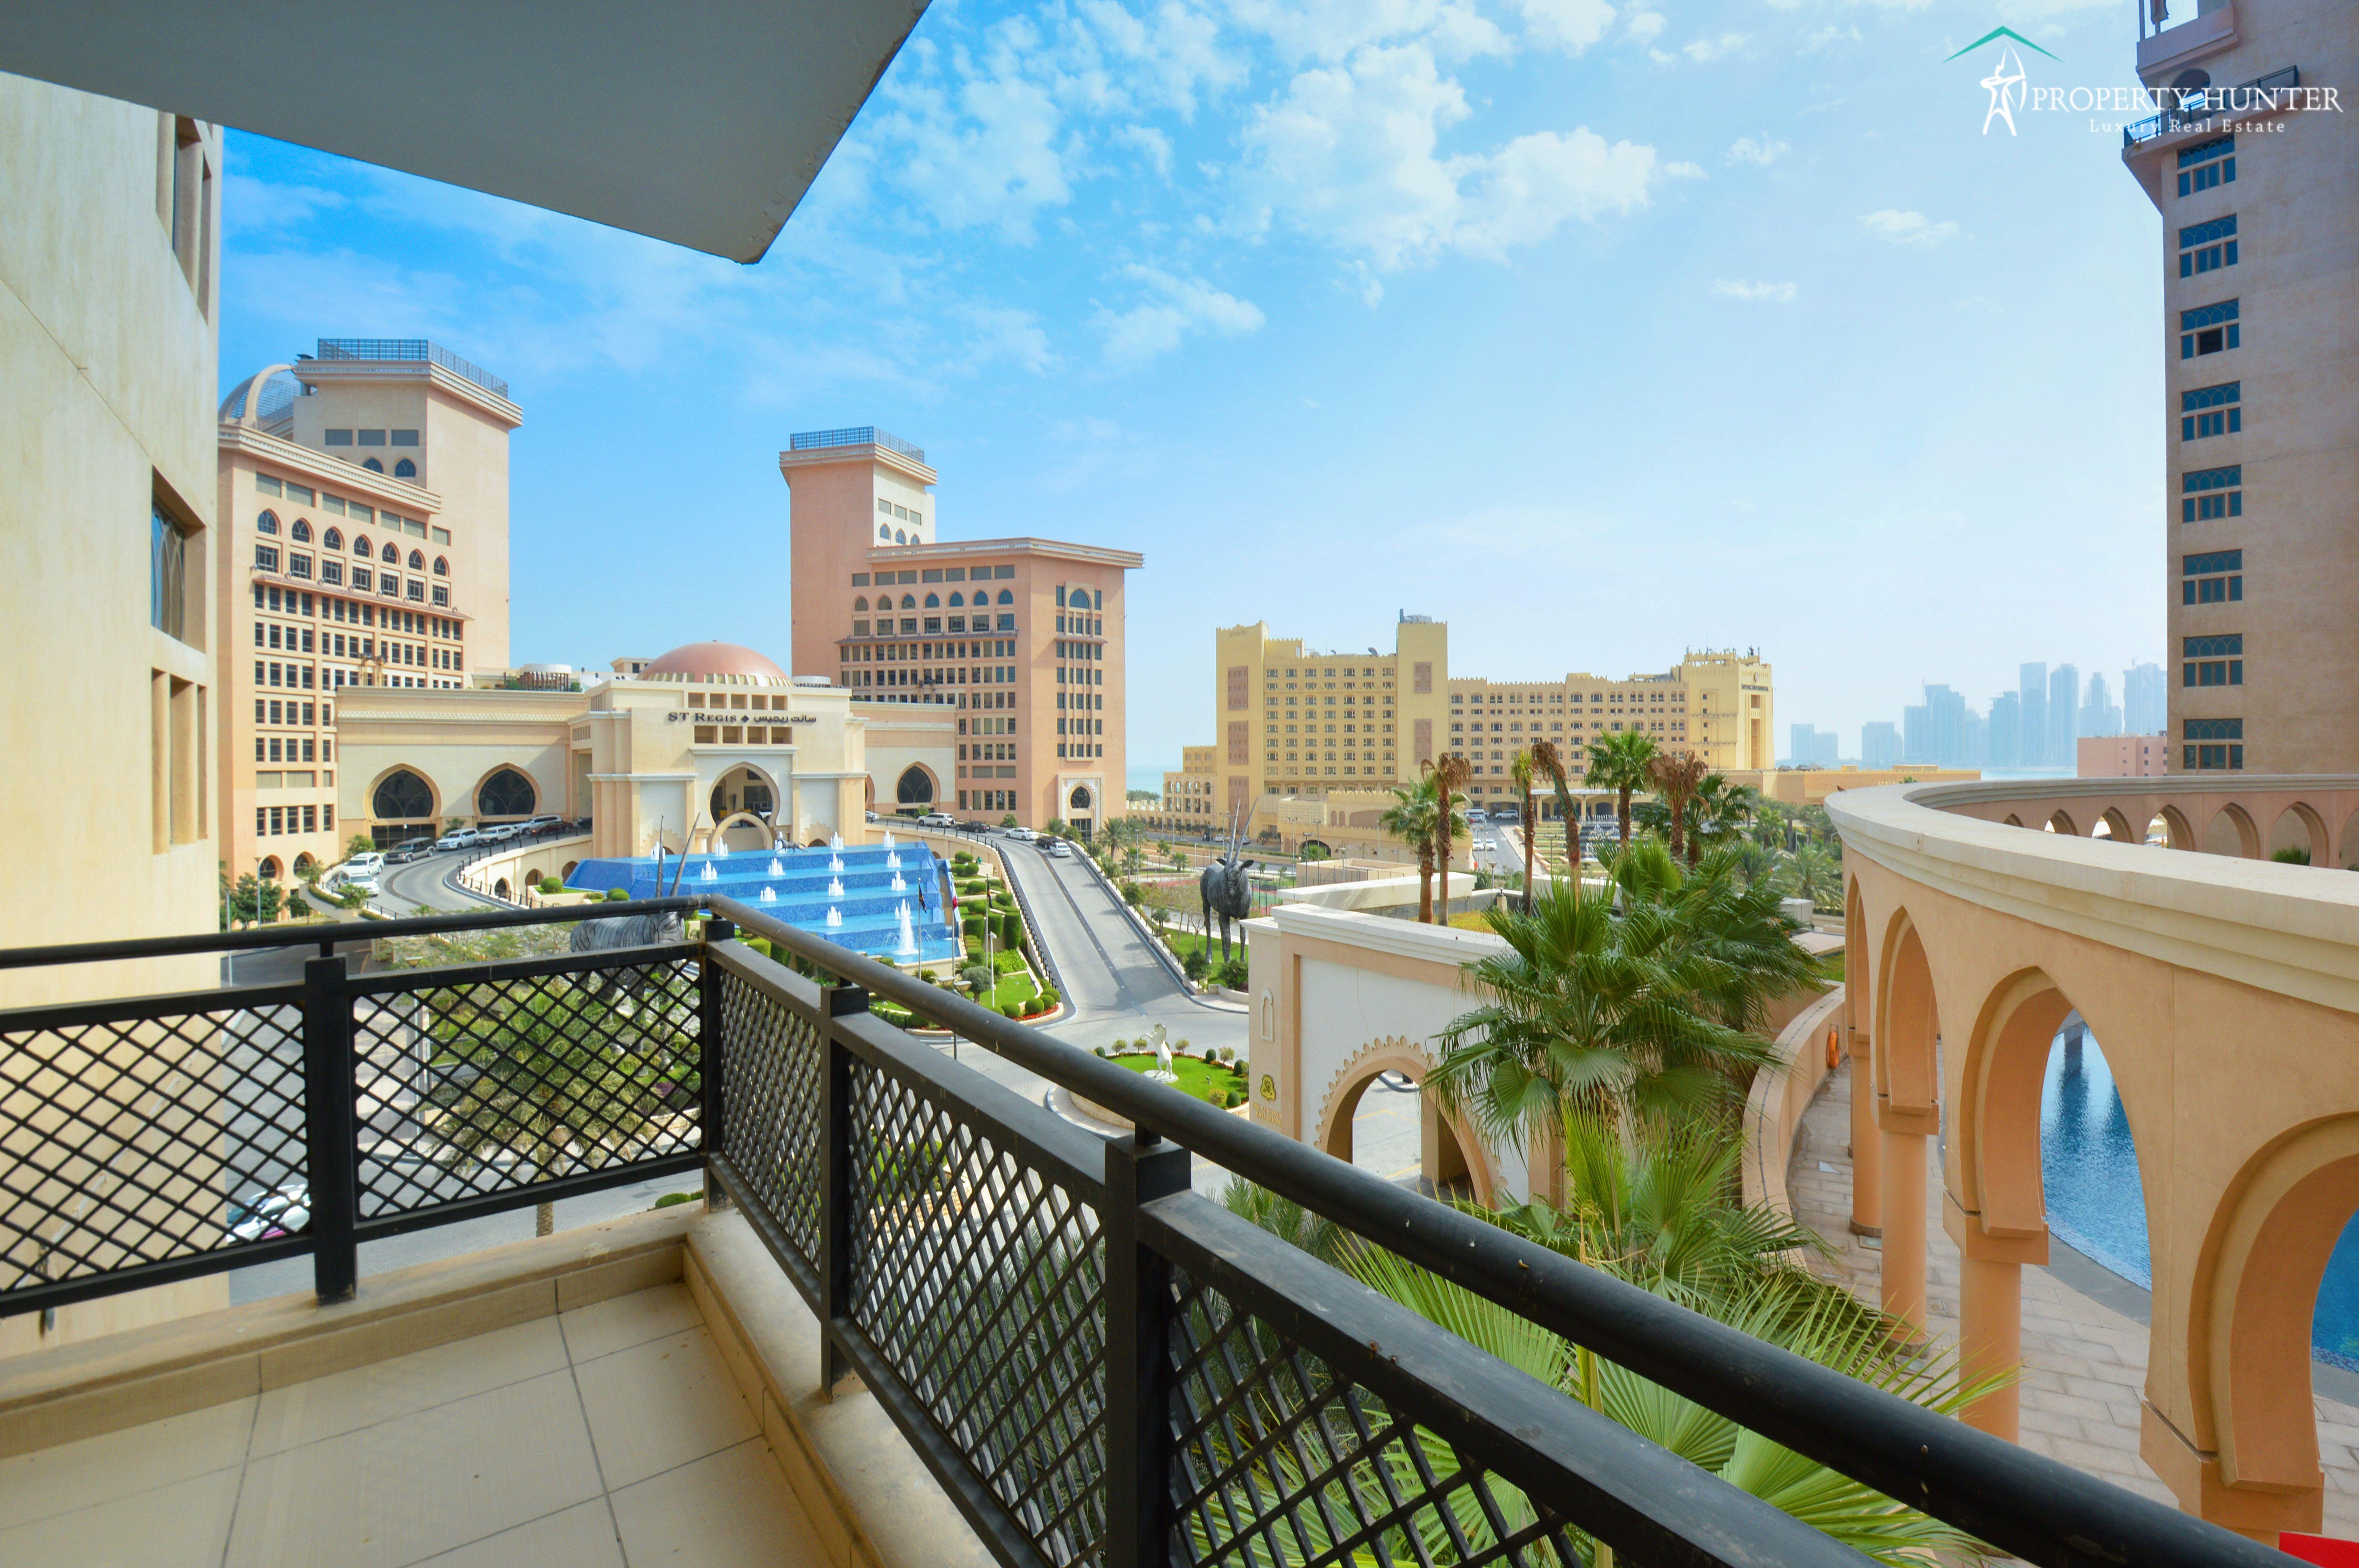 Luxury Life Style In The Pearl Qatar Book Your Apartments Call Now 4021 0800 Propertyhunter Qa Doha Qatarairways Uae